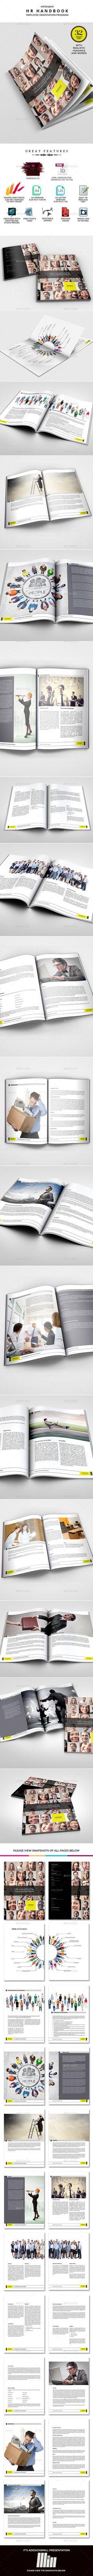 HR Handbook and Employee Manual Template